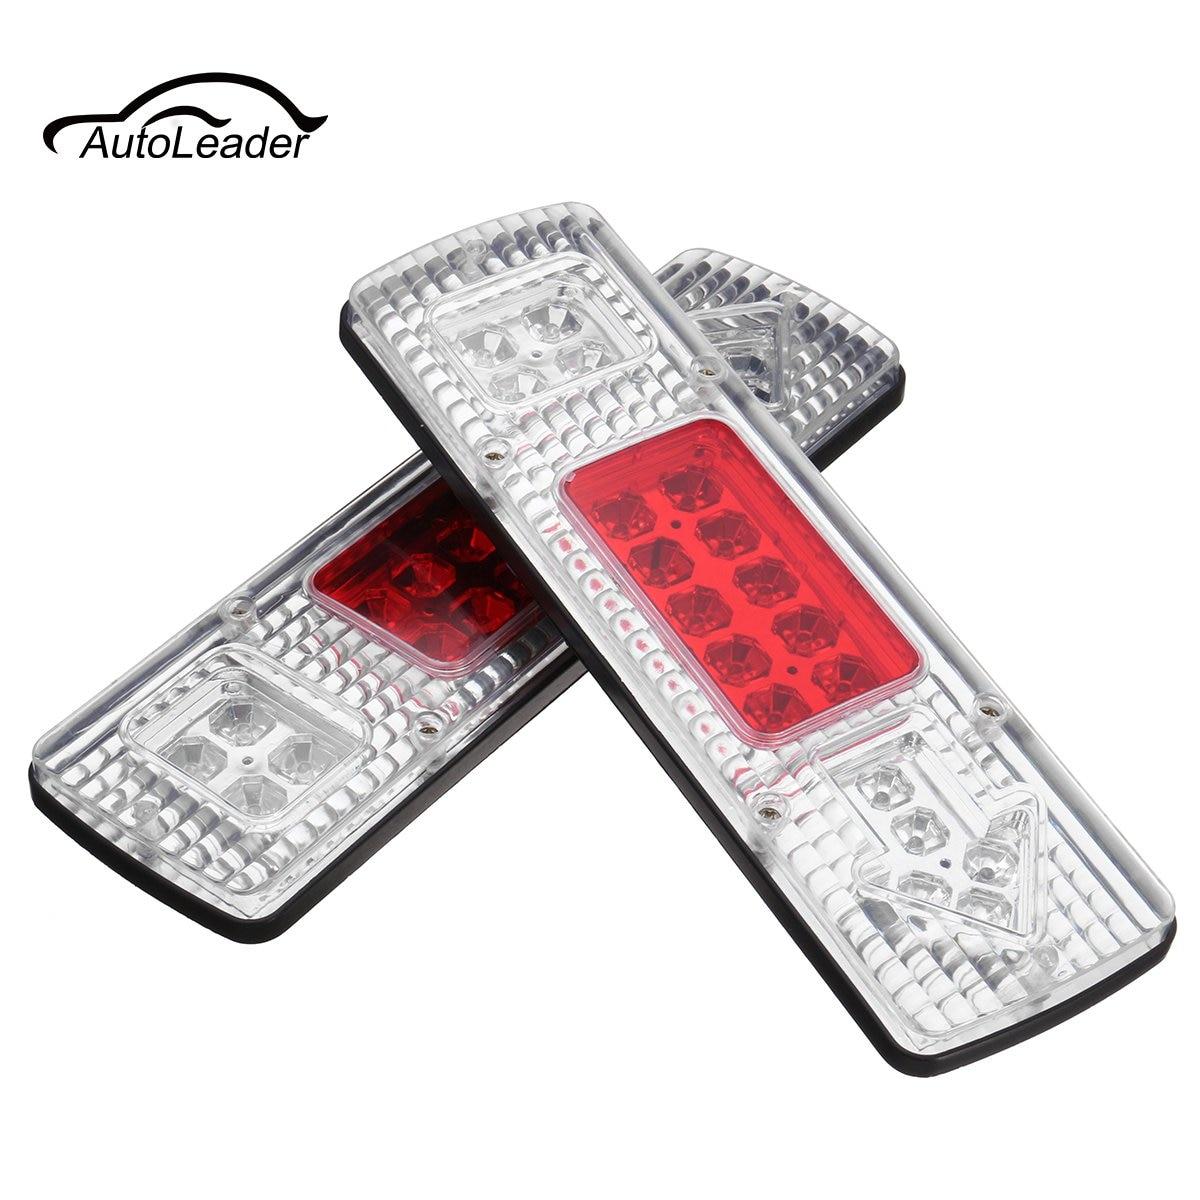 2Pcs 12V LED Warning Light Universal Arrow Truck Trailer Rear Tail Brake Stop Reverse Turn Indicator Light Lamp